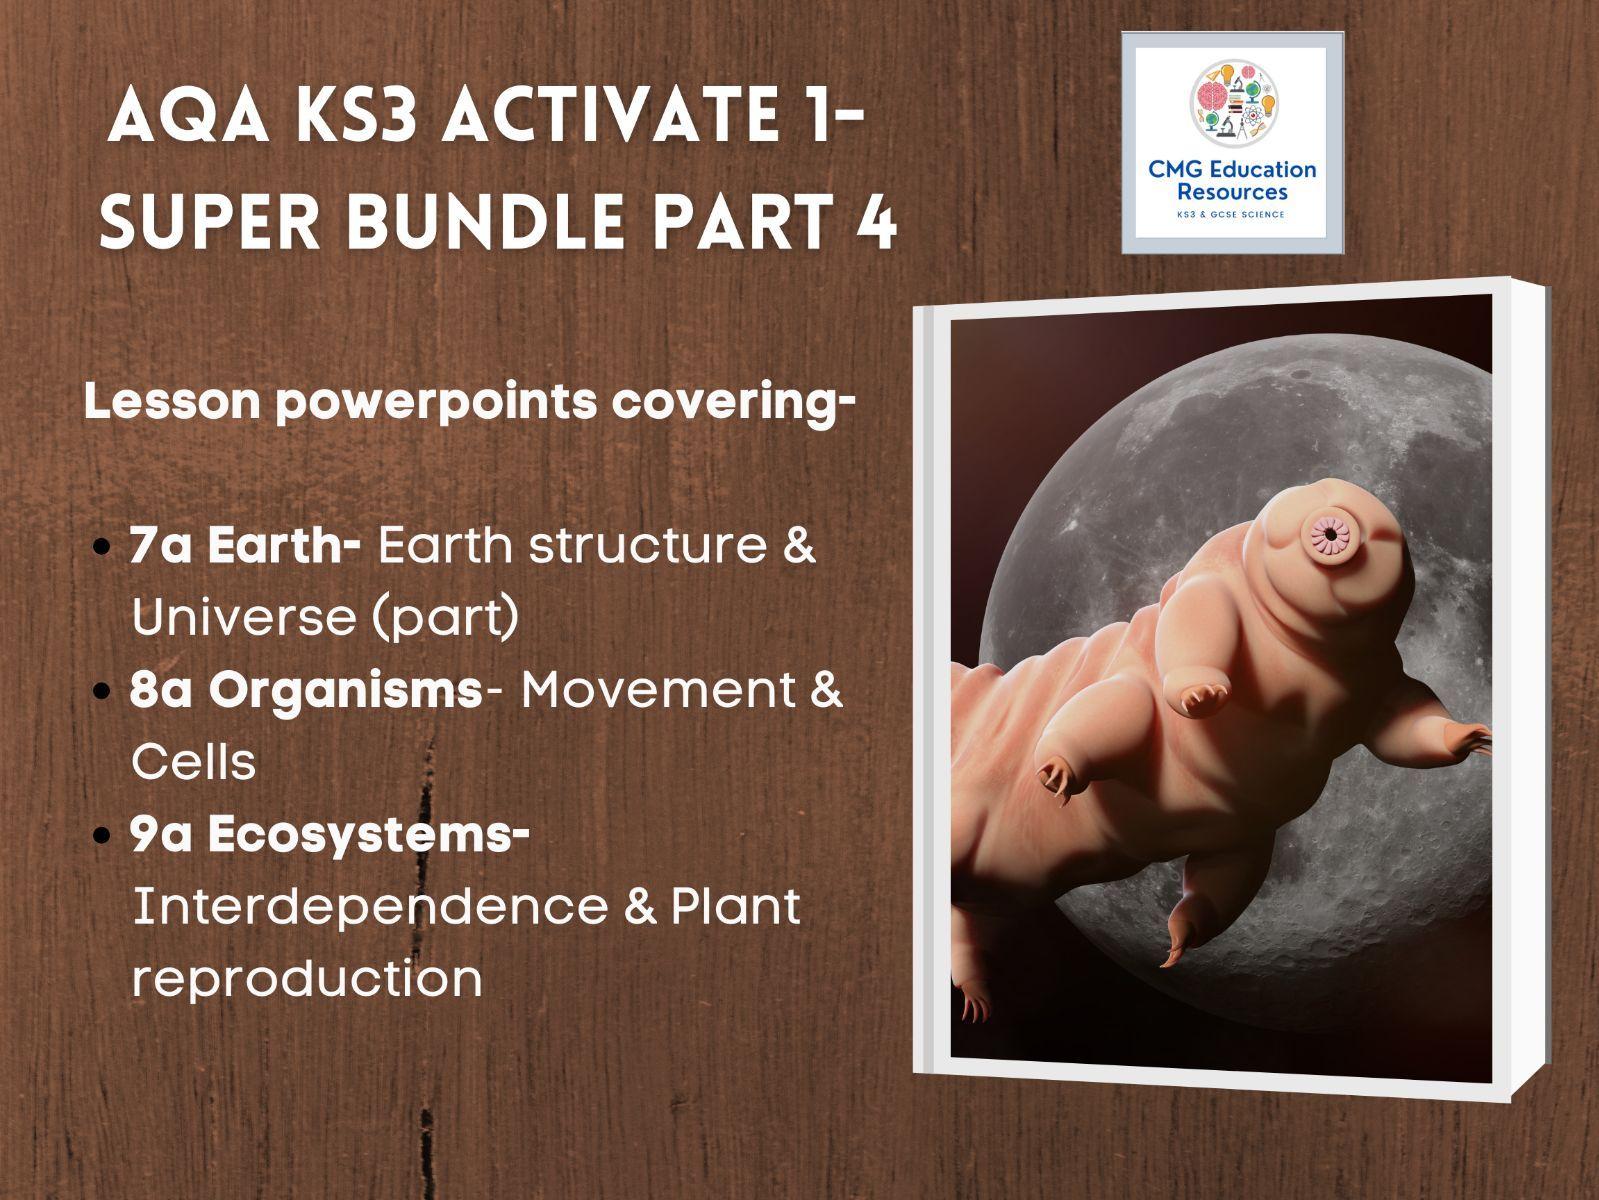 KS3 AQA Activate 1- Super bundle part 4